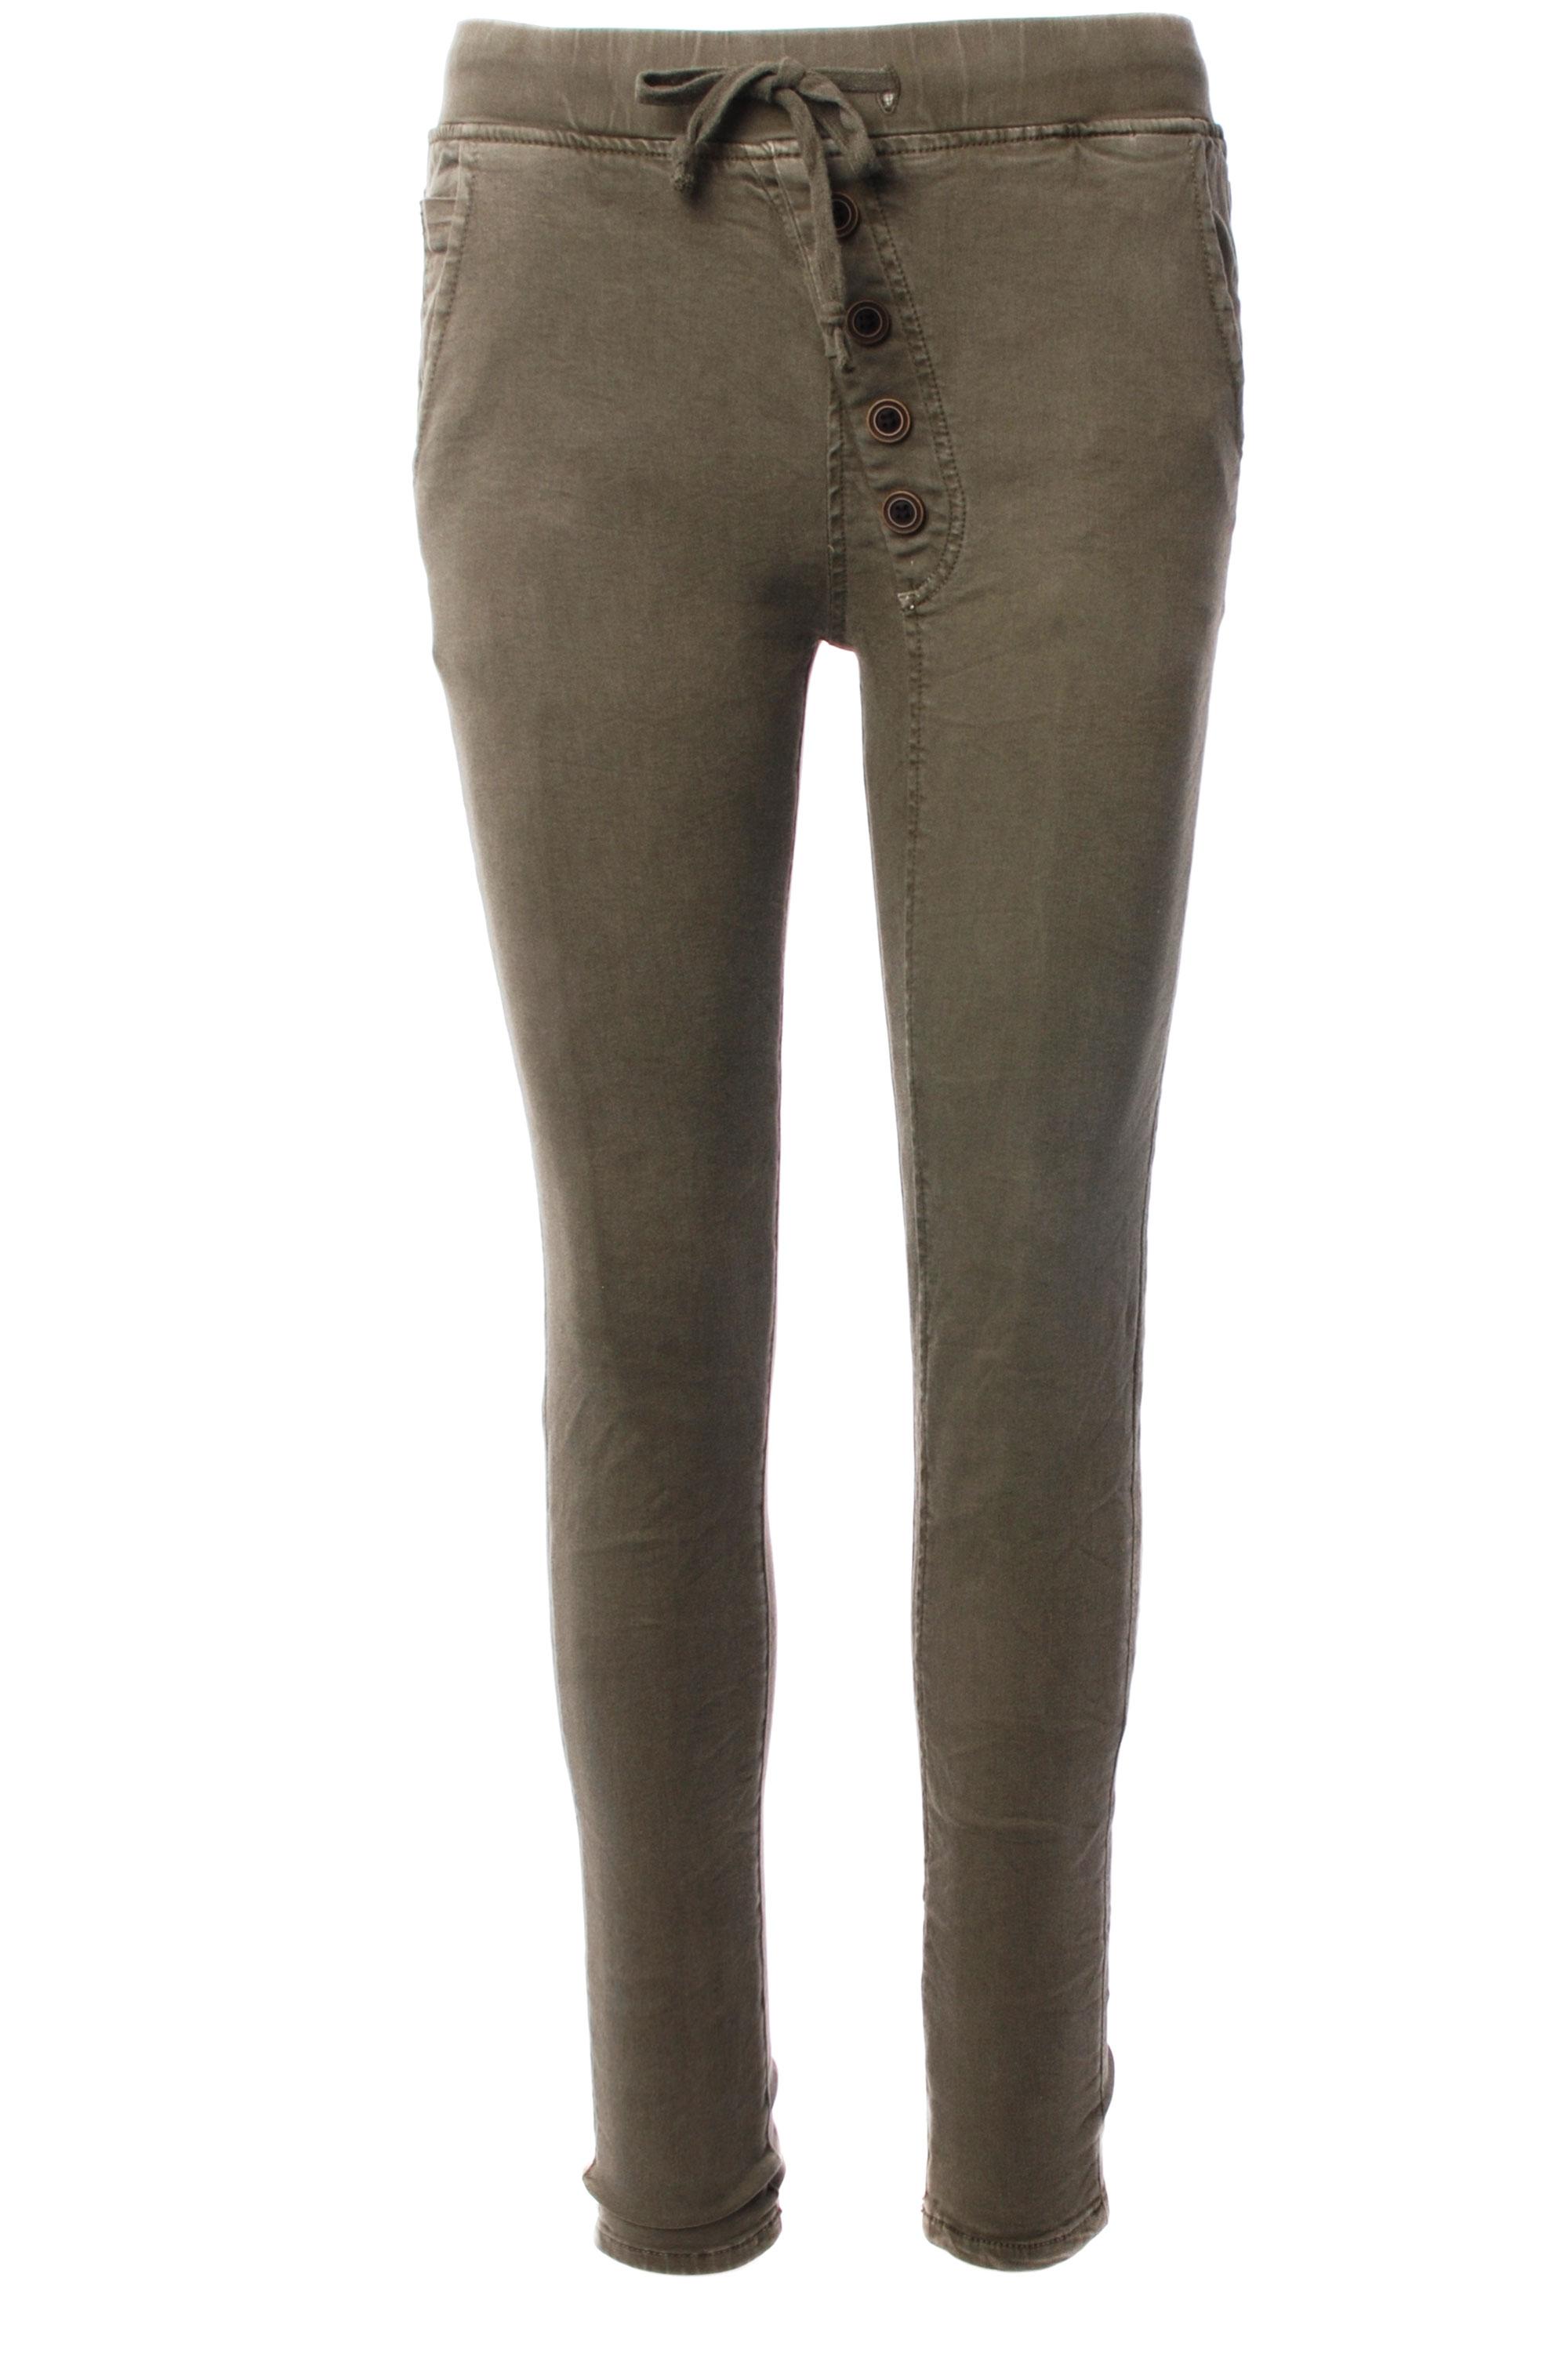 Spodnie - 76-J9901 MILI - Unisono